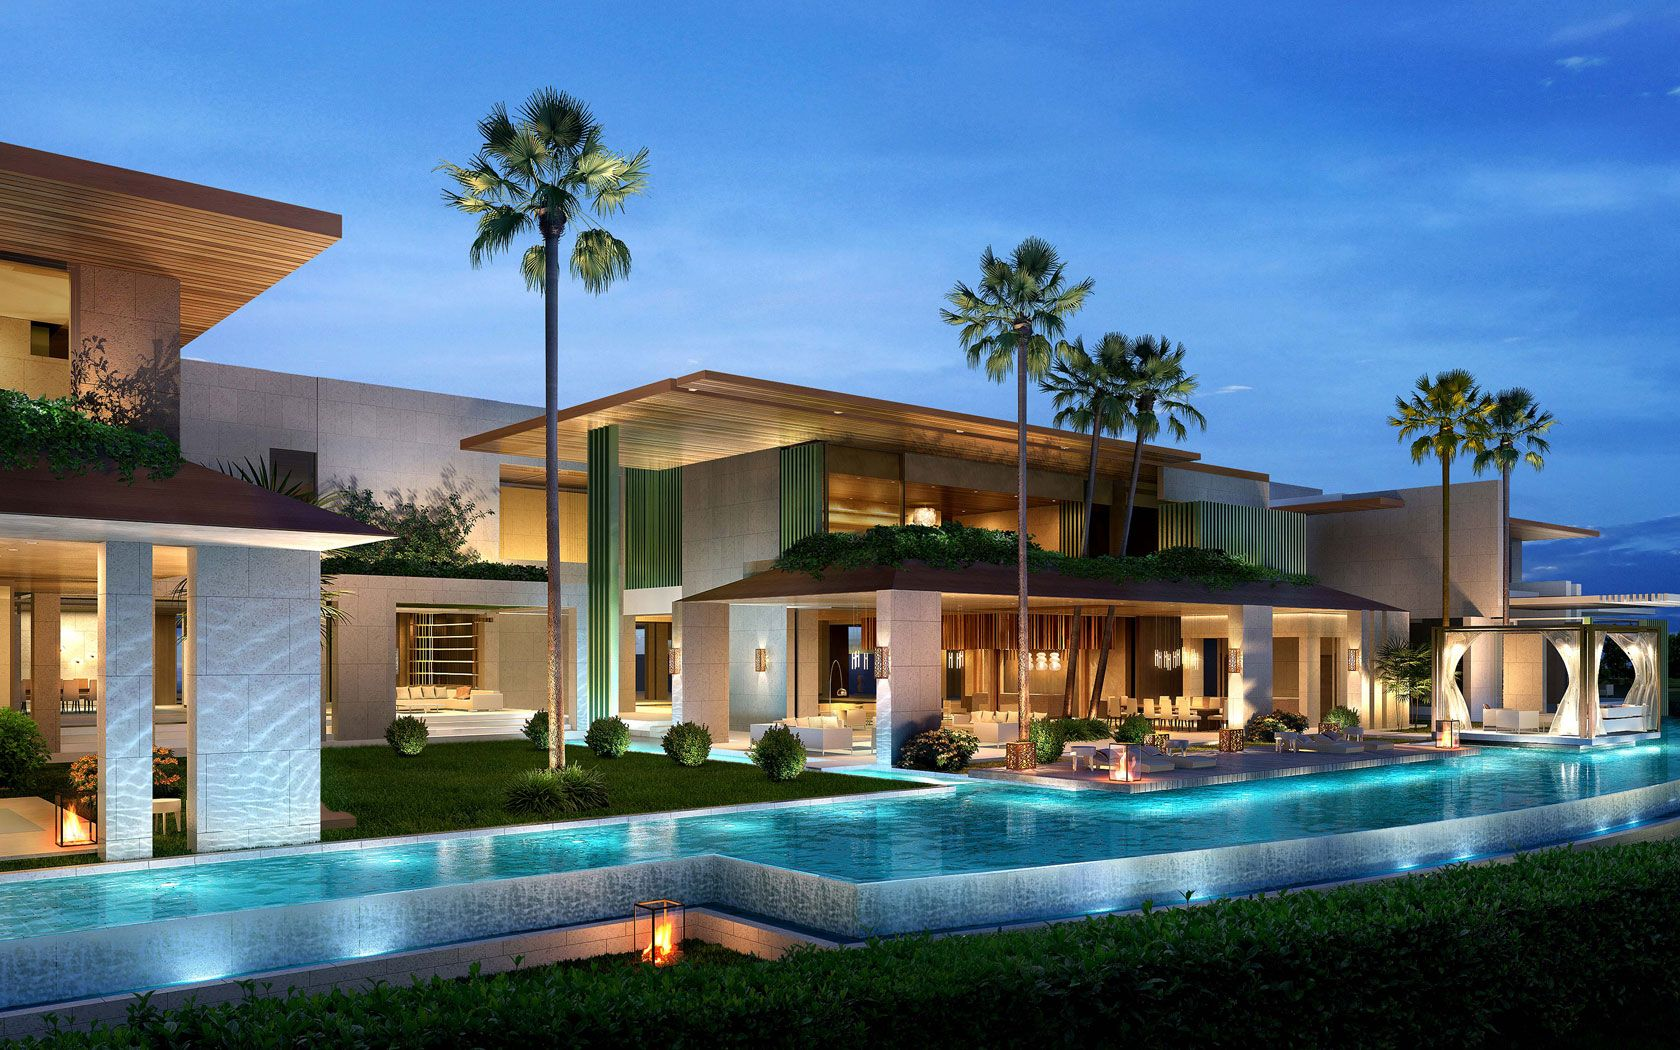 Emirates Hills, Dubai, Saota Architects Luxury modern